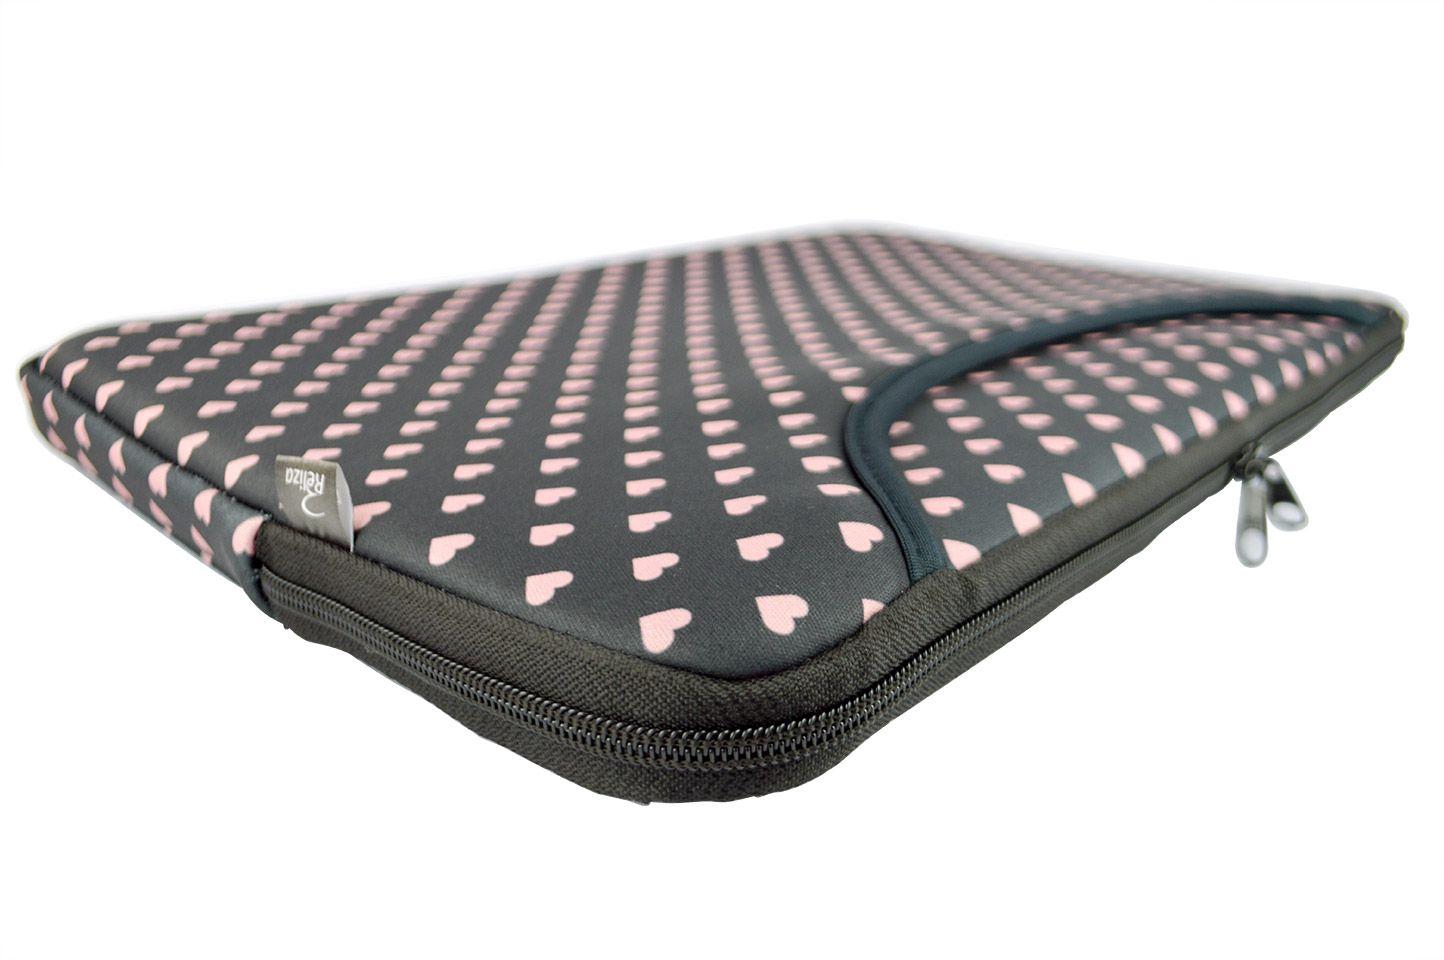 Capa Case para Notebook 15.6 com Bolso Frontal - Love Chocolate